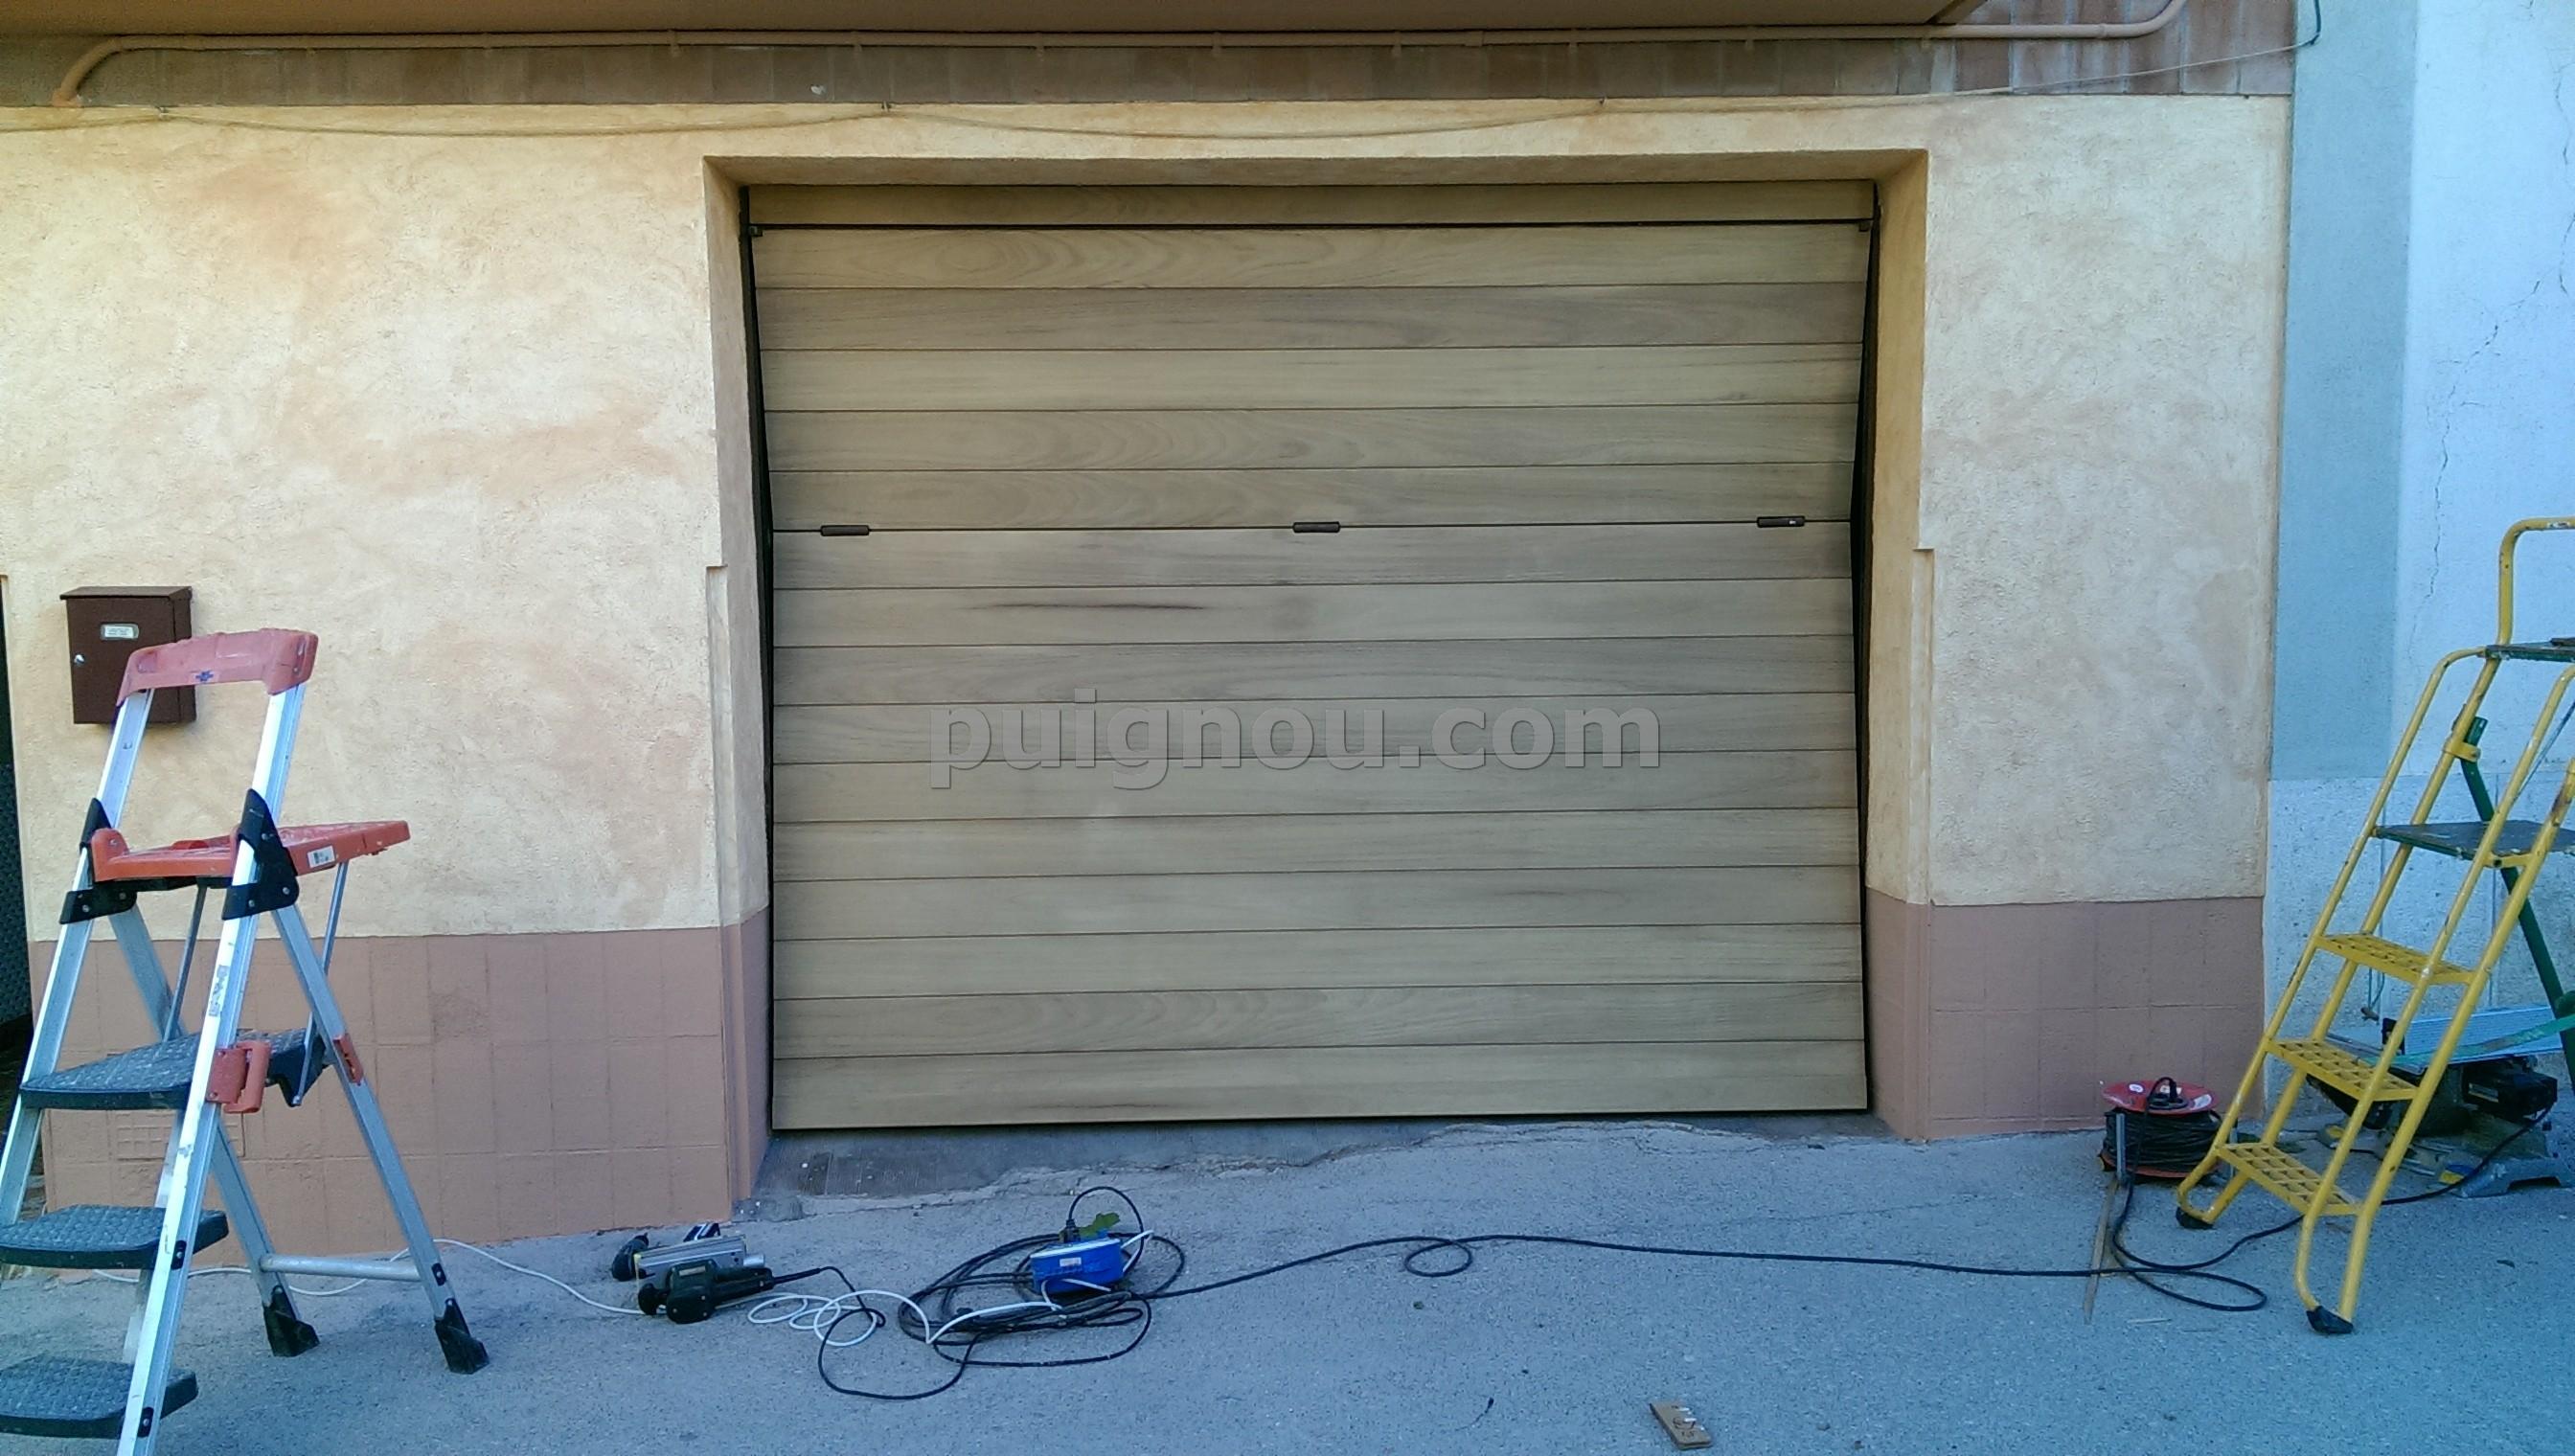 Puignou puigpelatforrar puerta de plancha con madera de for Planchas para forrar banos